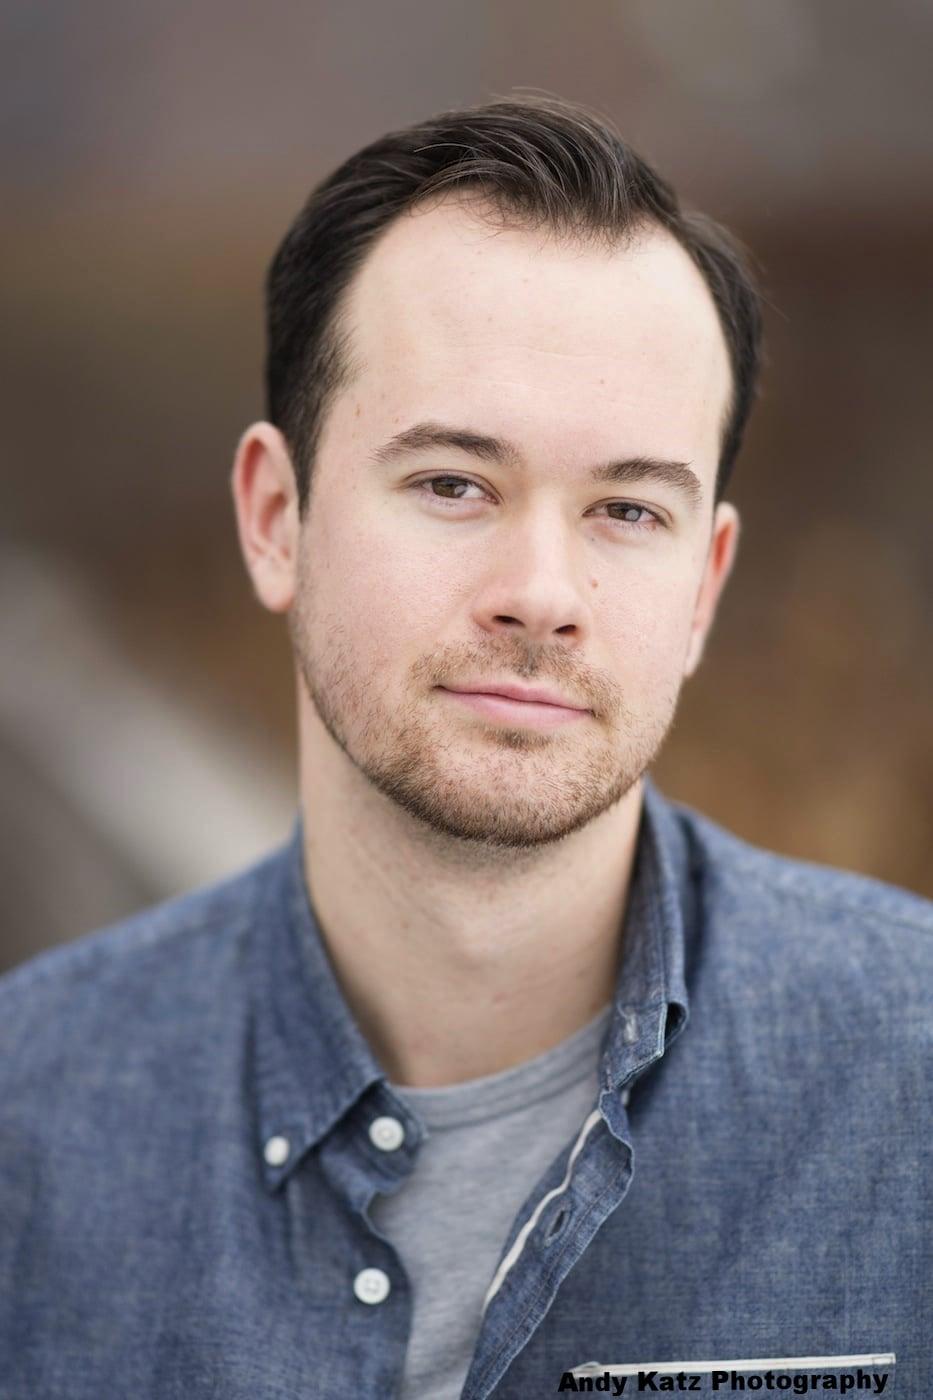 Andy Katz, photographer.